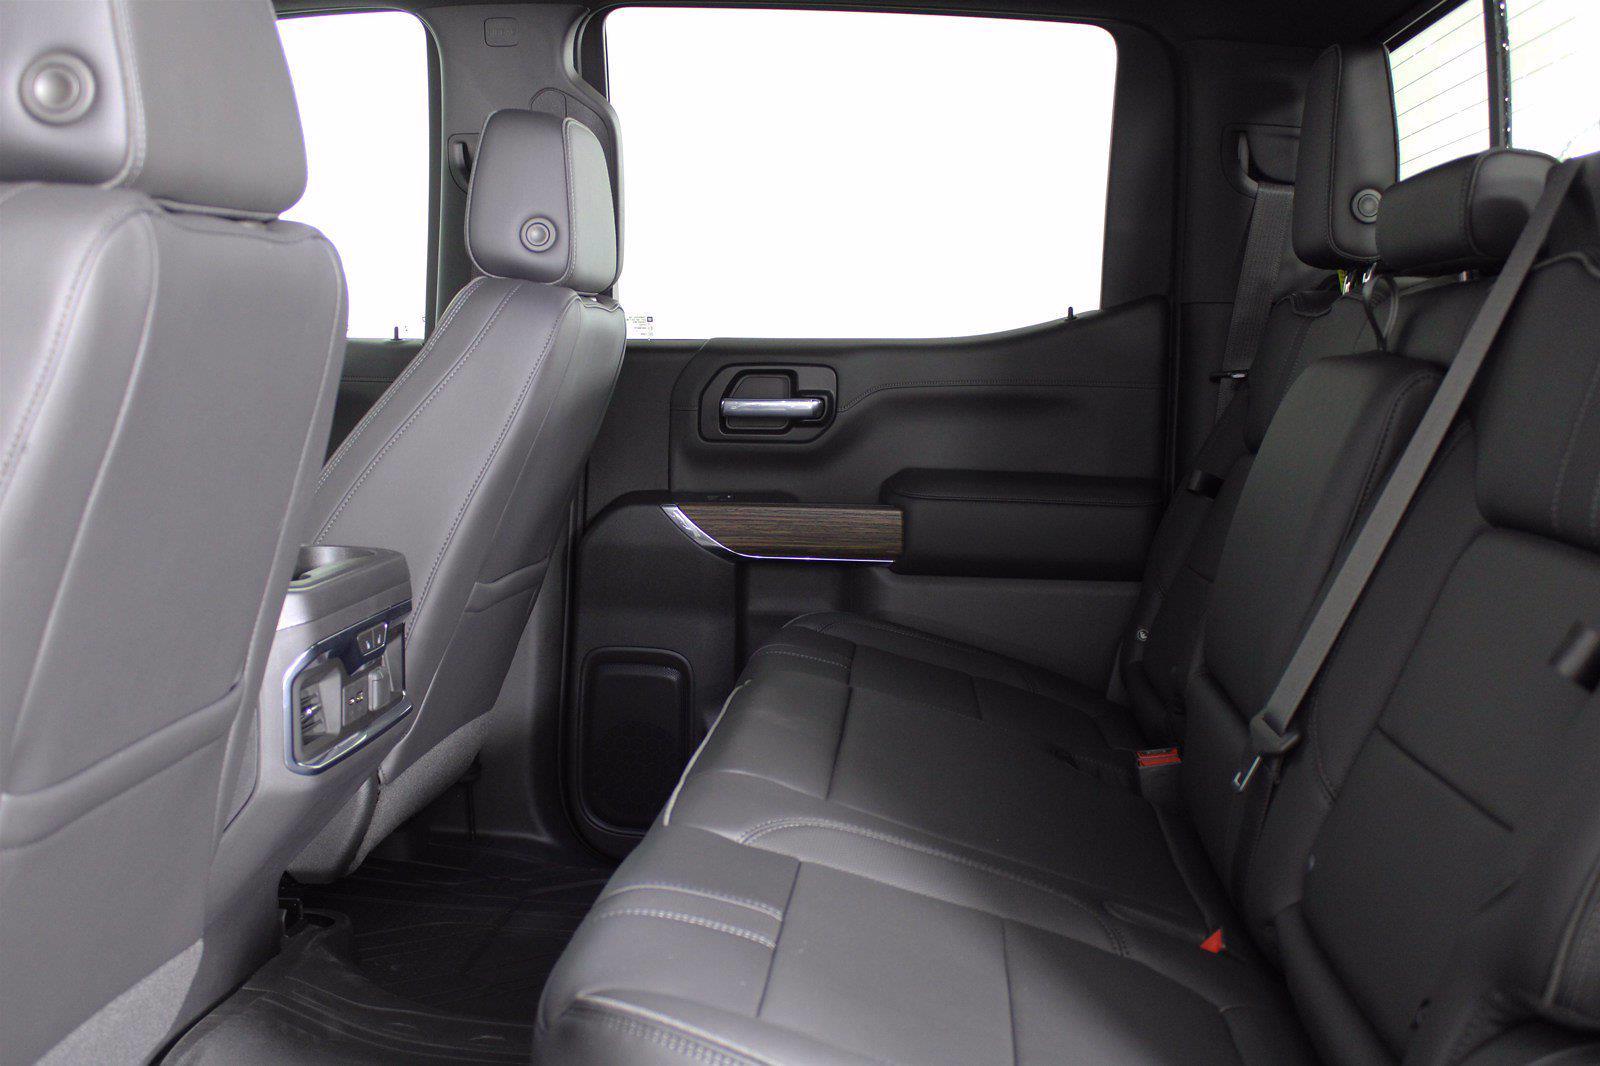 2021 Chevrolet Silverado 1500 Crew Cab 4x4, Pickup #D111072 - photo 17